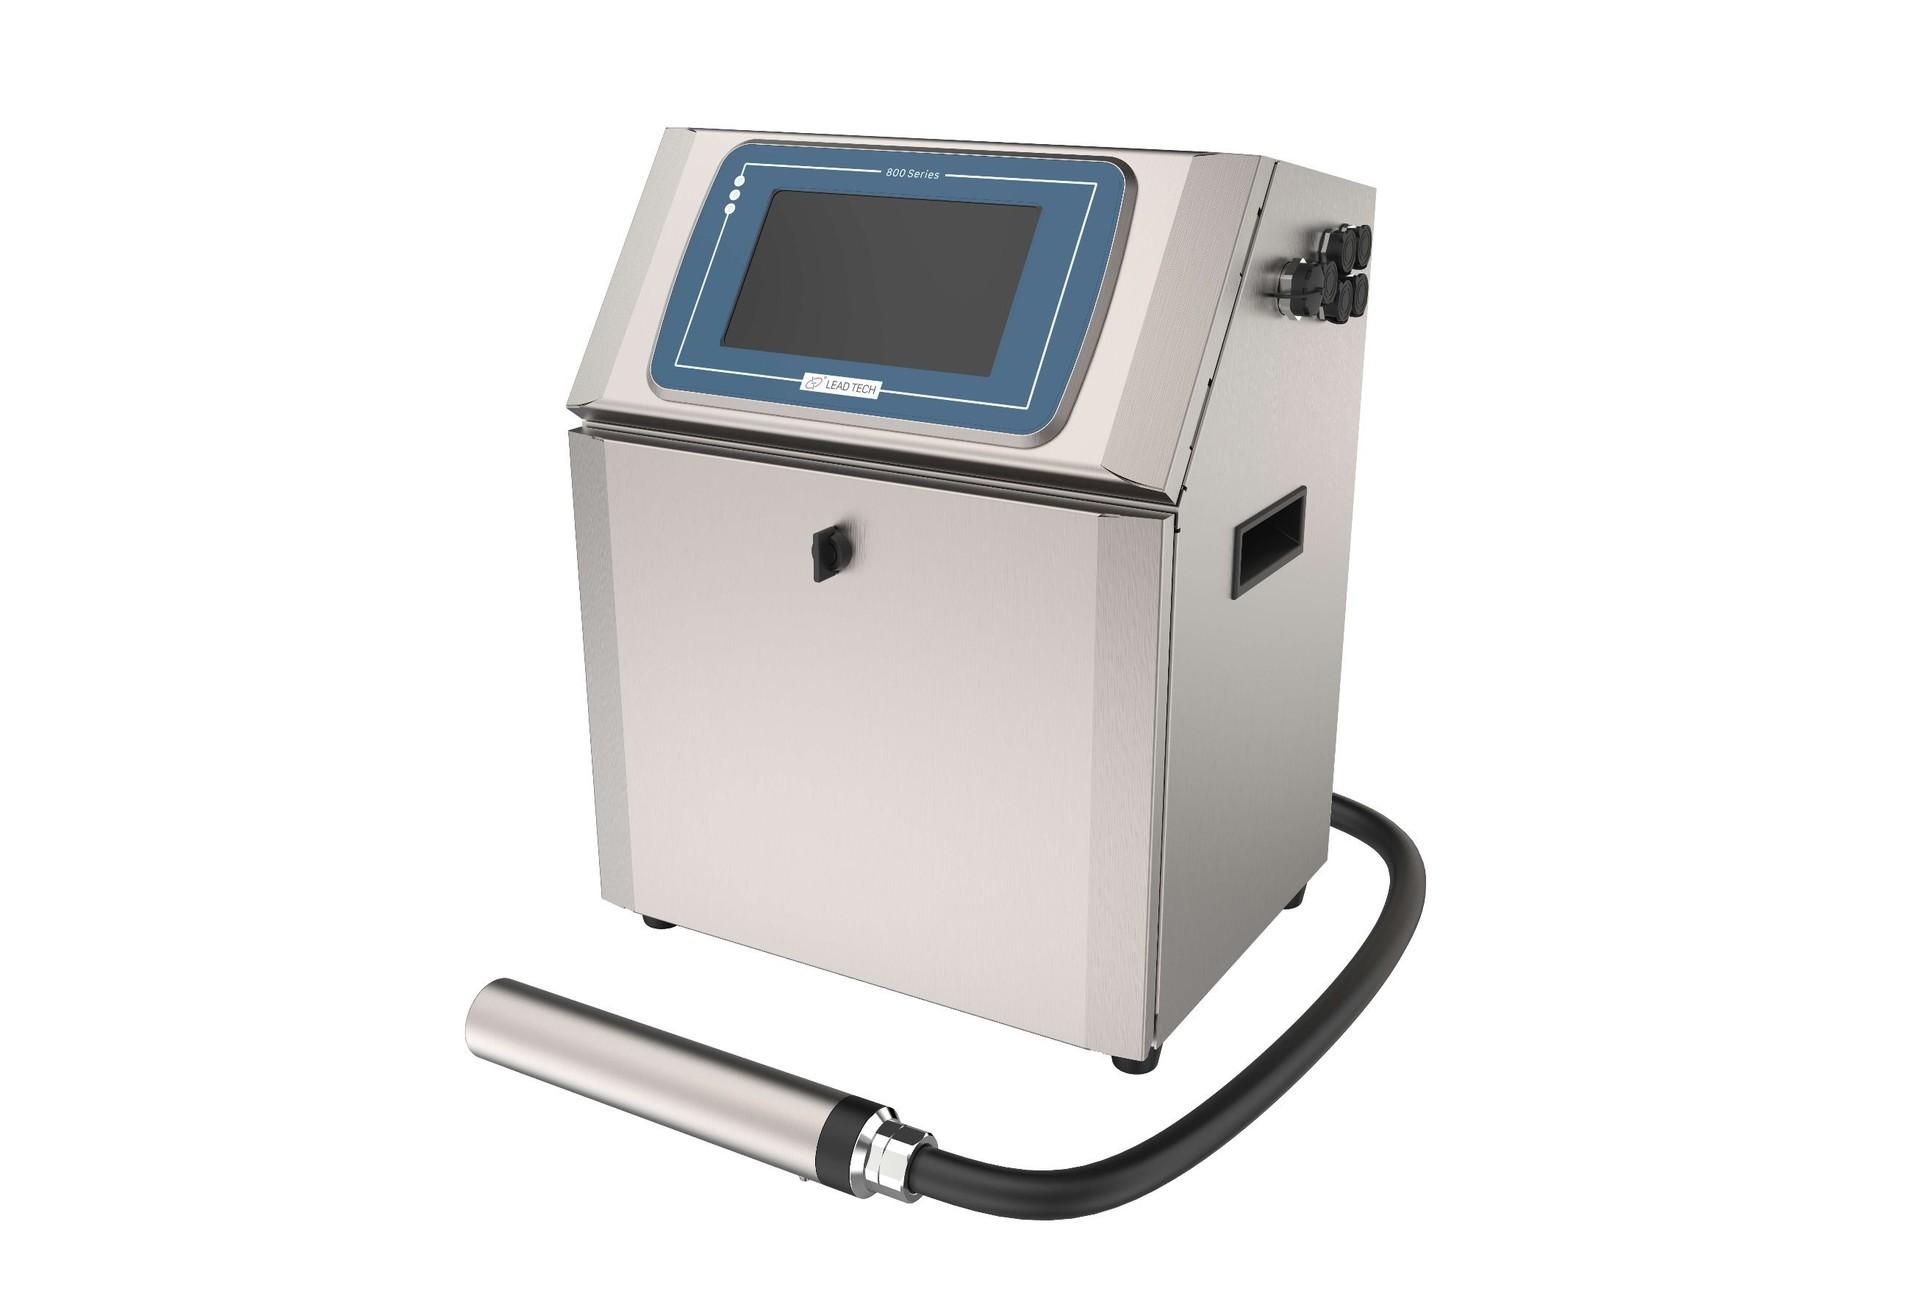 Lead Tech Barcode Coding Machine Cij Inkjet Printer Lt800